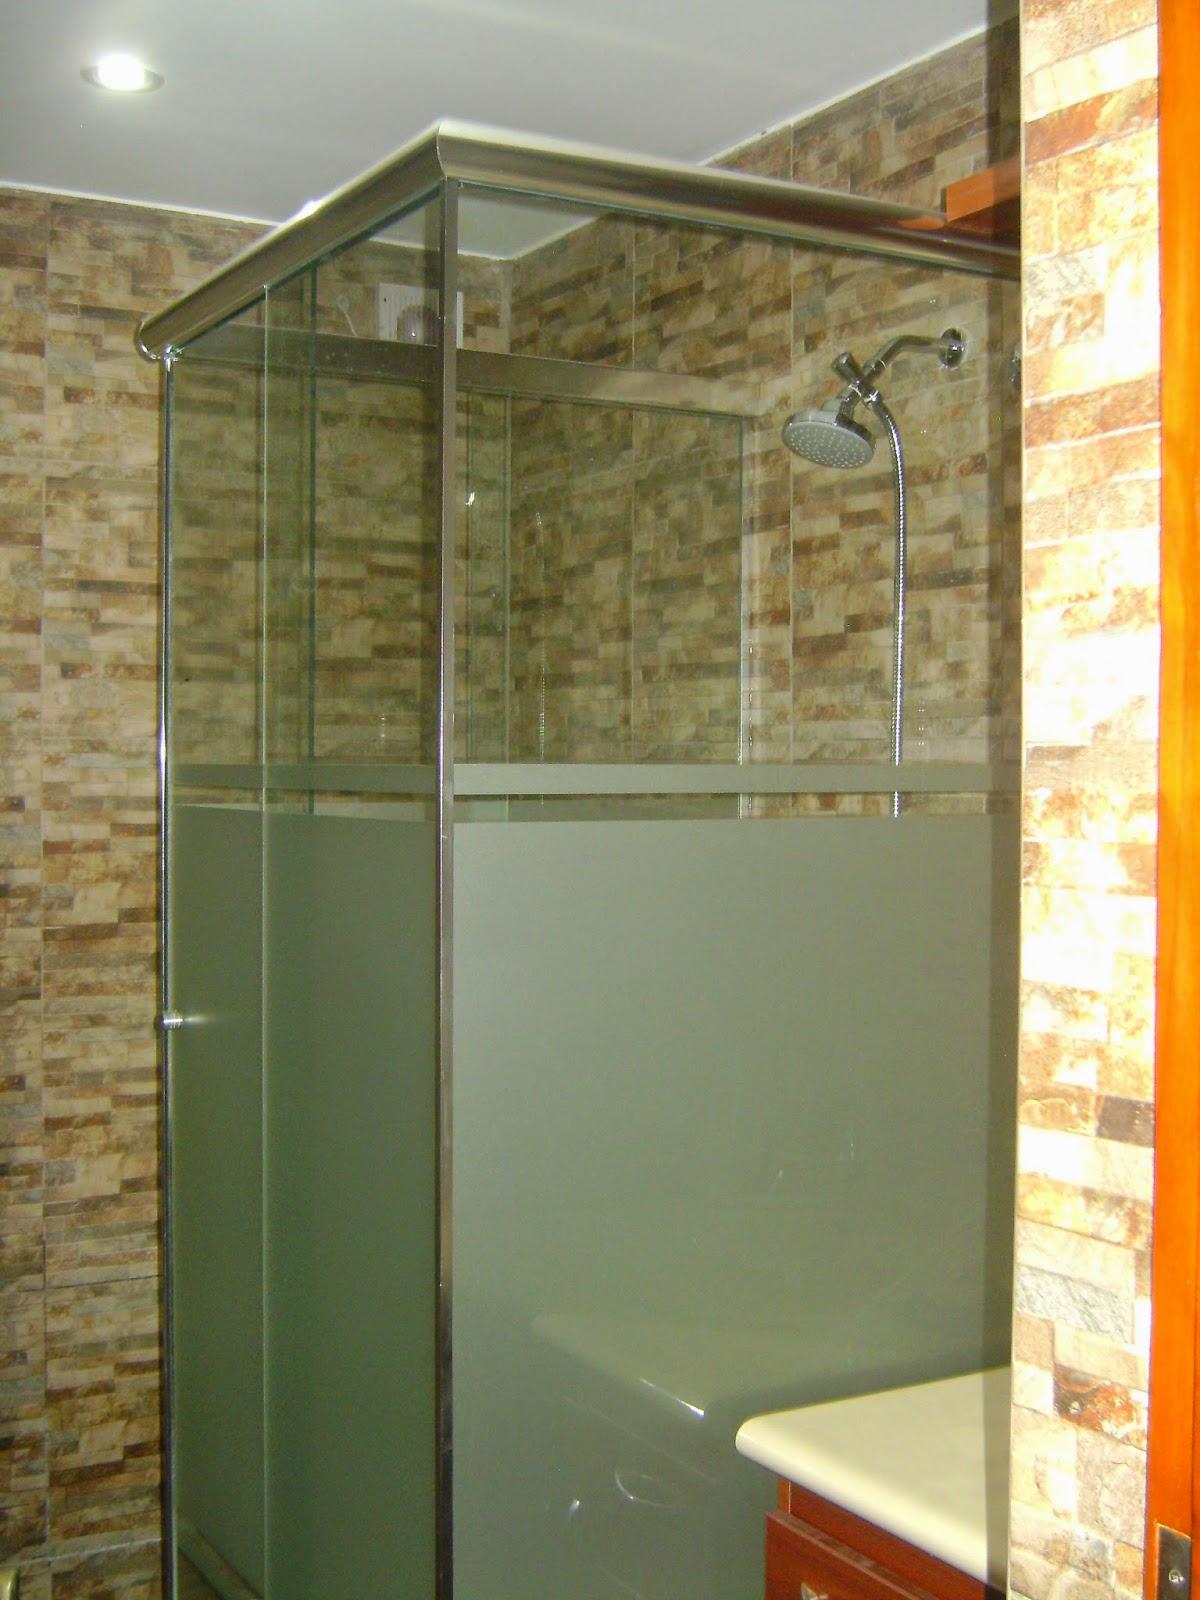 Lider soluciones generales puertas de ducha vidrio for Puertas de ducha